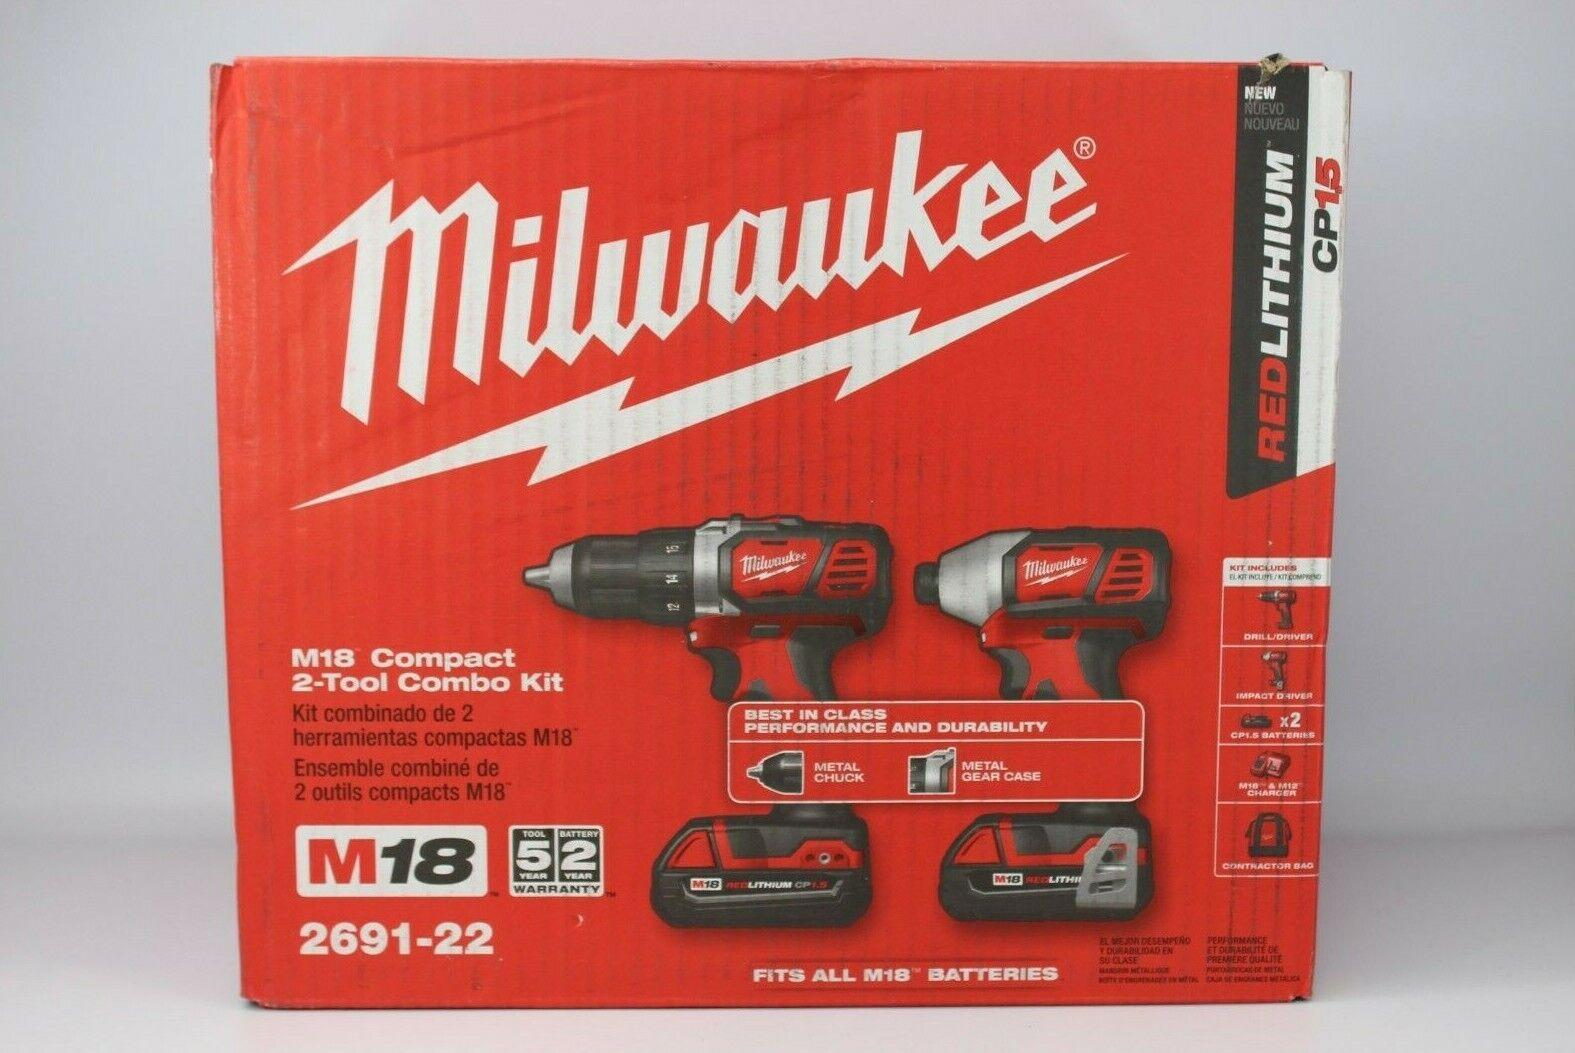 Milwaukee 2691-22 M18 18-Volt Cordless Power Lithium-Ion 2-T